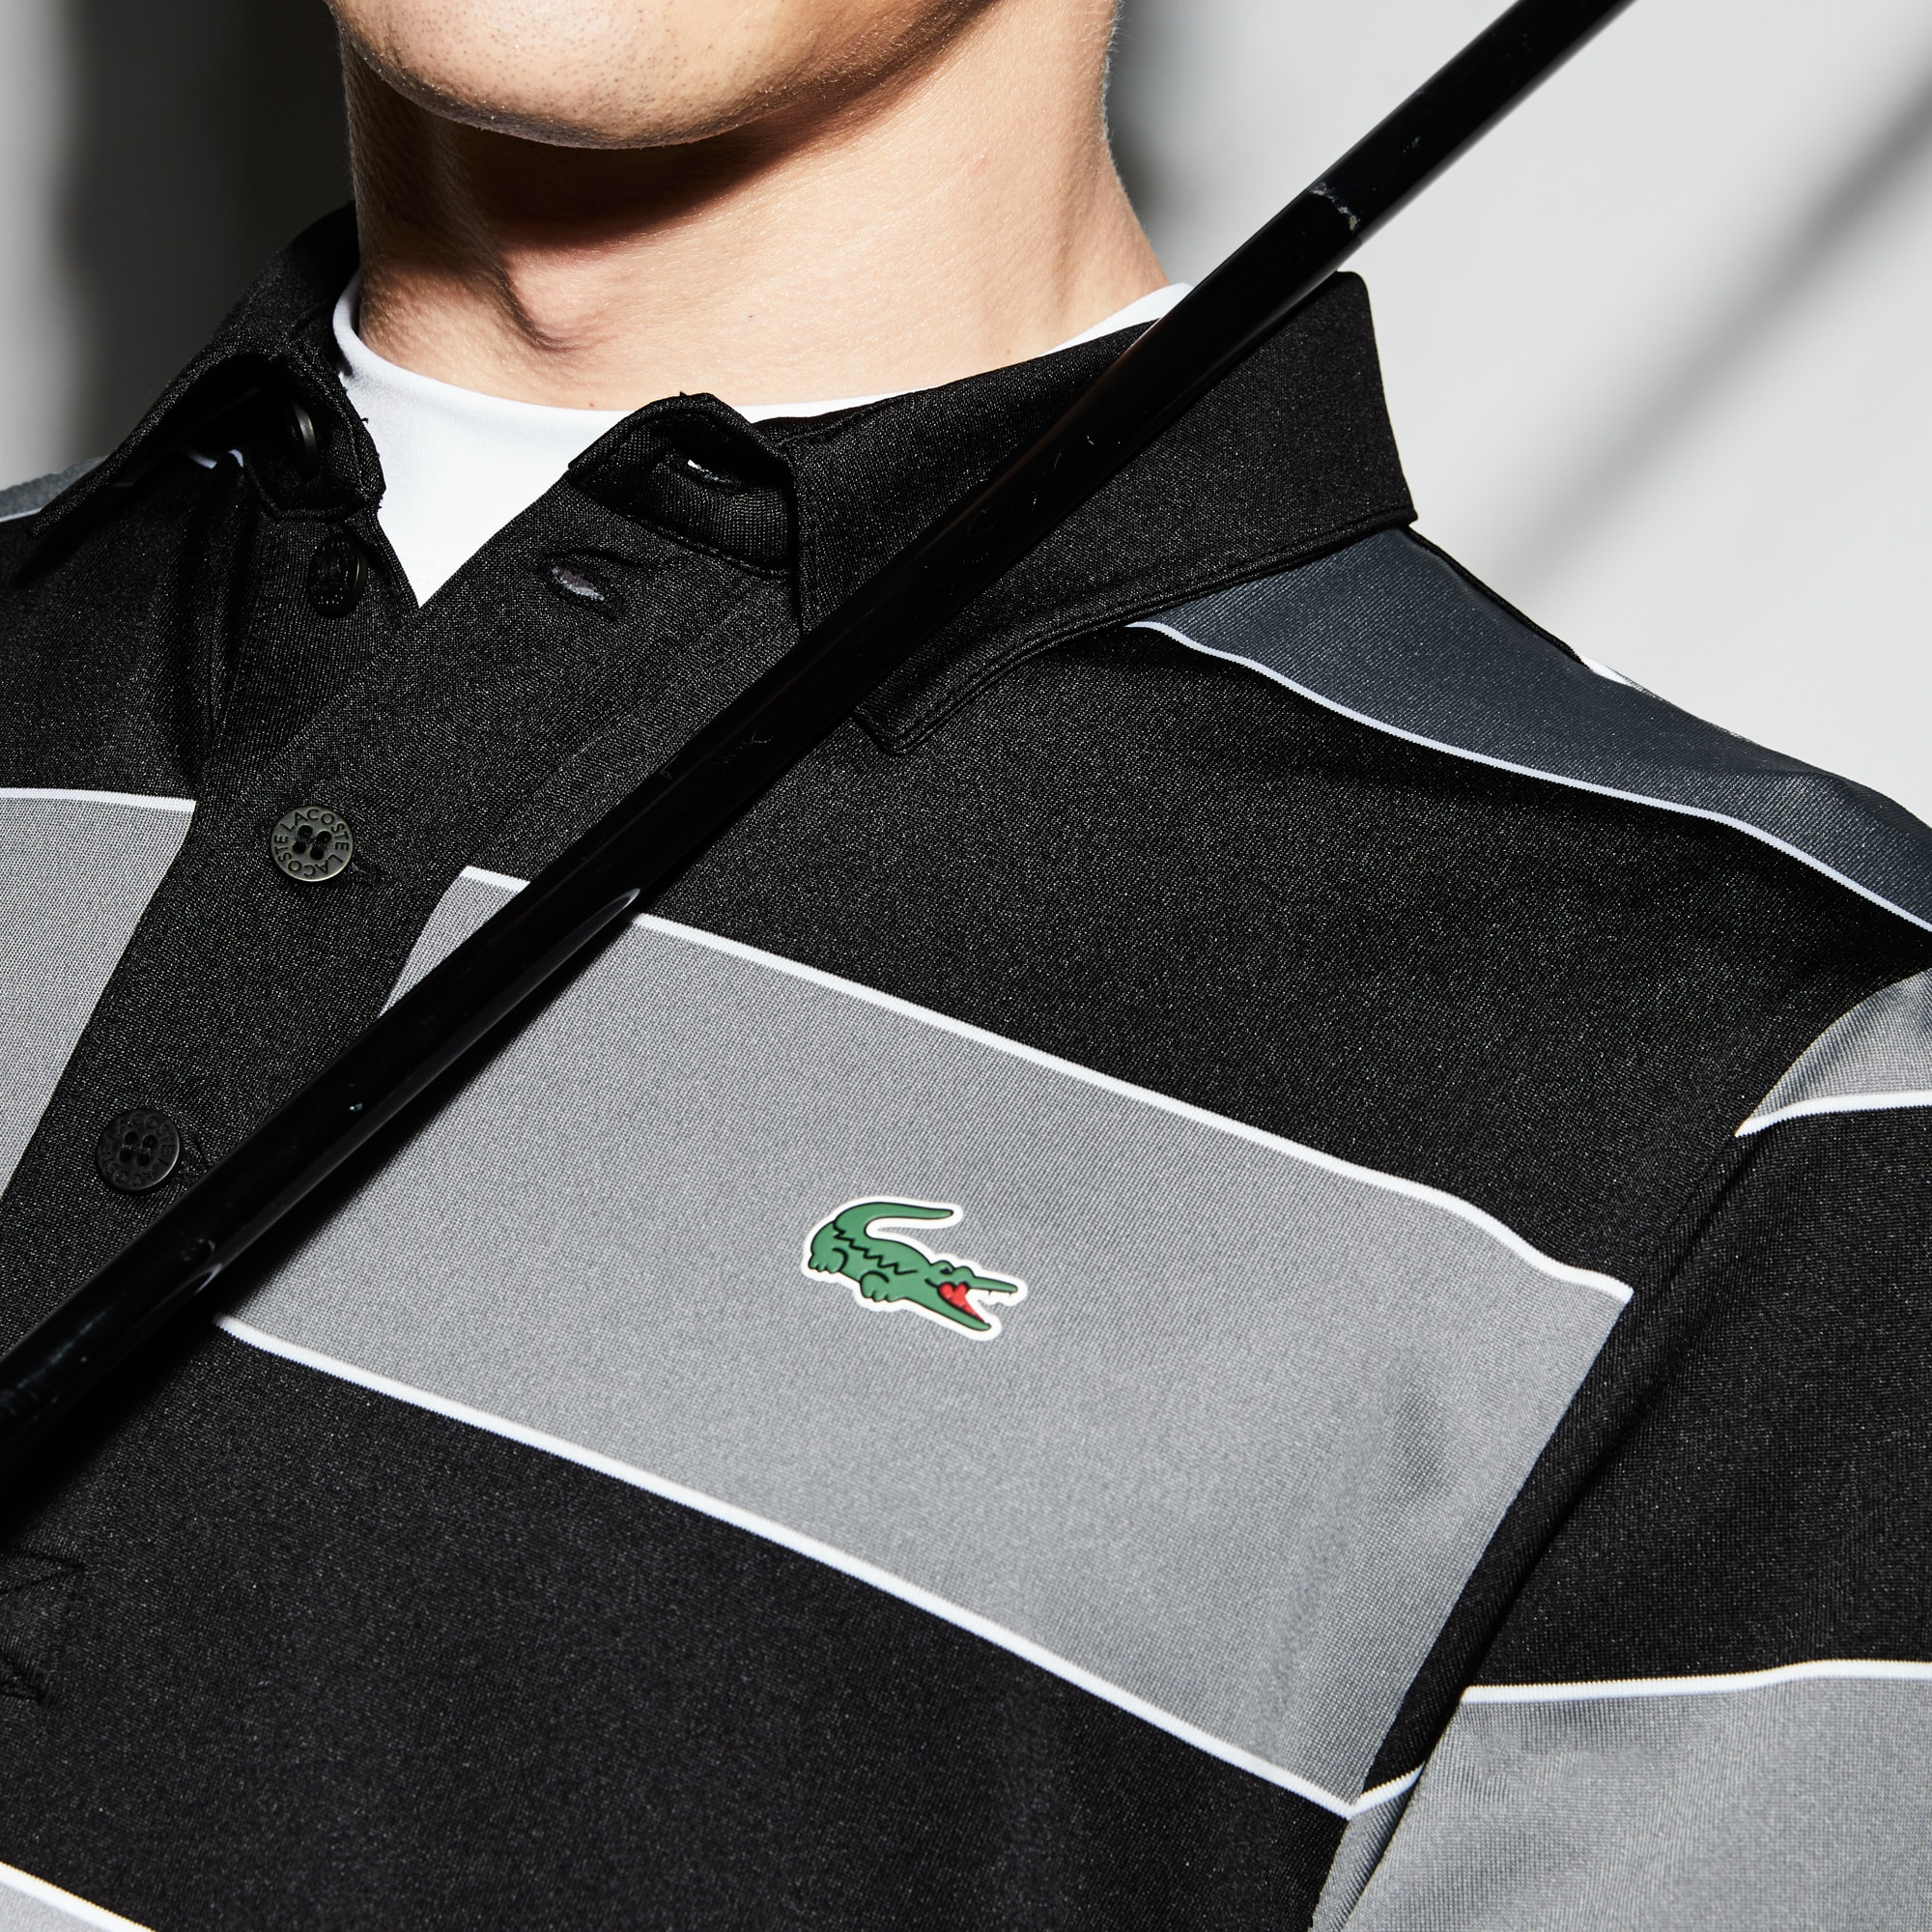 Lacoste - Herren LACOSTE SPORT gestreiftes Golf-Poloshirt aus Jersey - 4